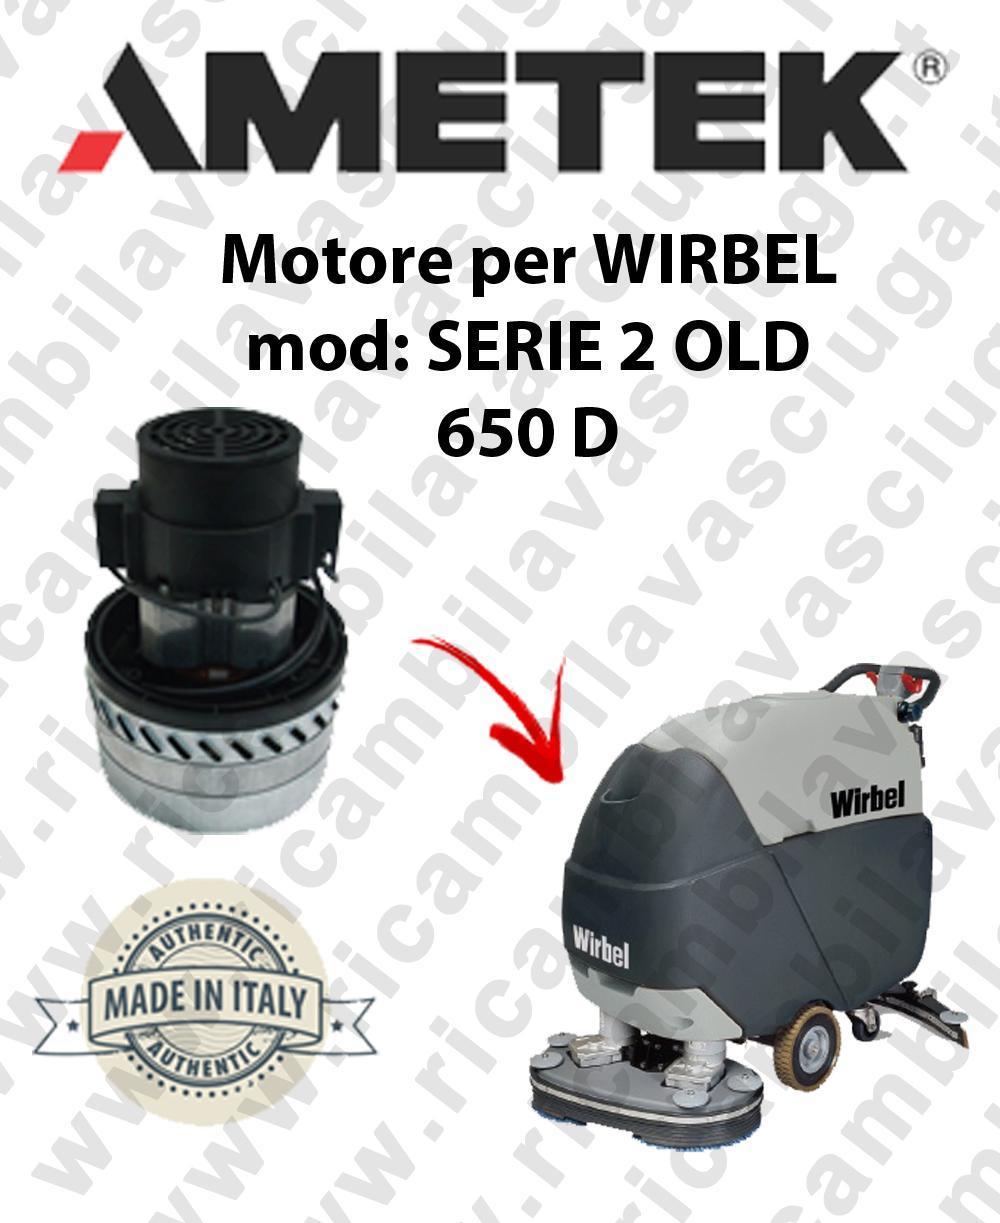 SERIE 2 OLD 650 D Motore de aspiración AMETEK para fregadora WIRBEL